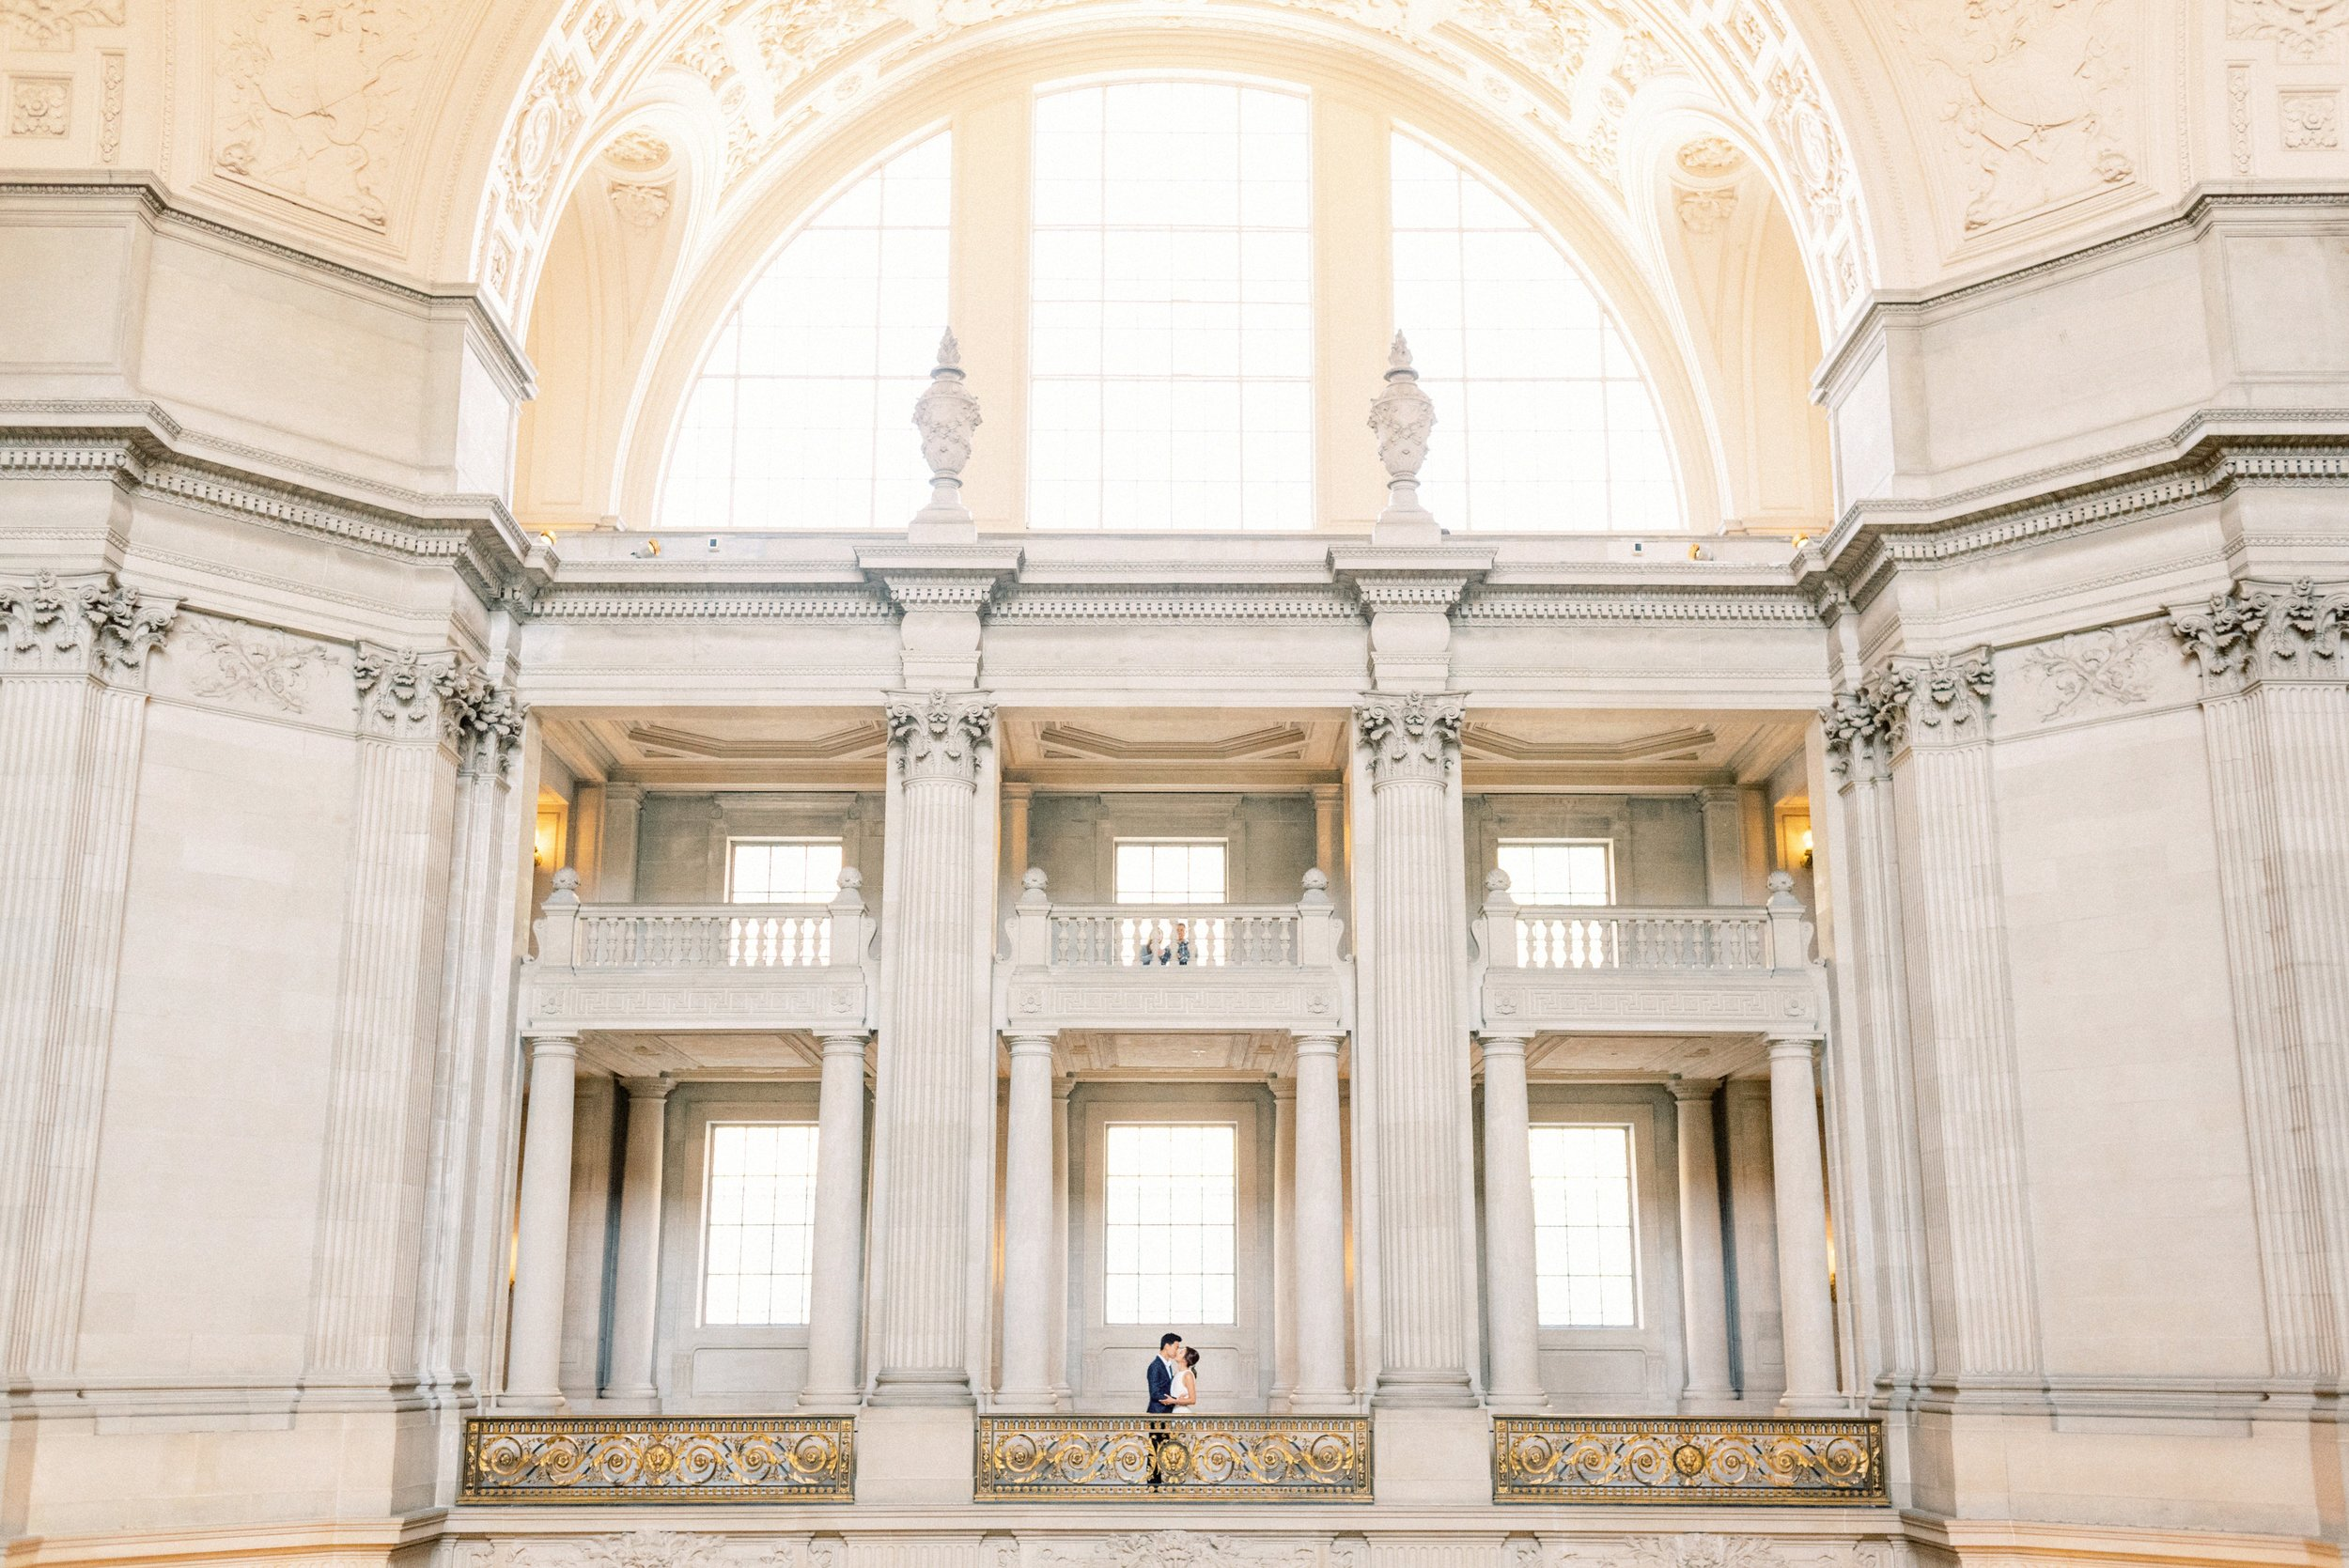 San-francisco-city-hall-photography-wedding-102.jpg